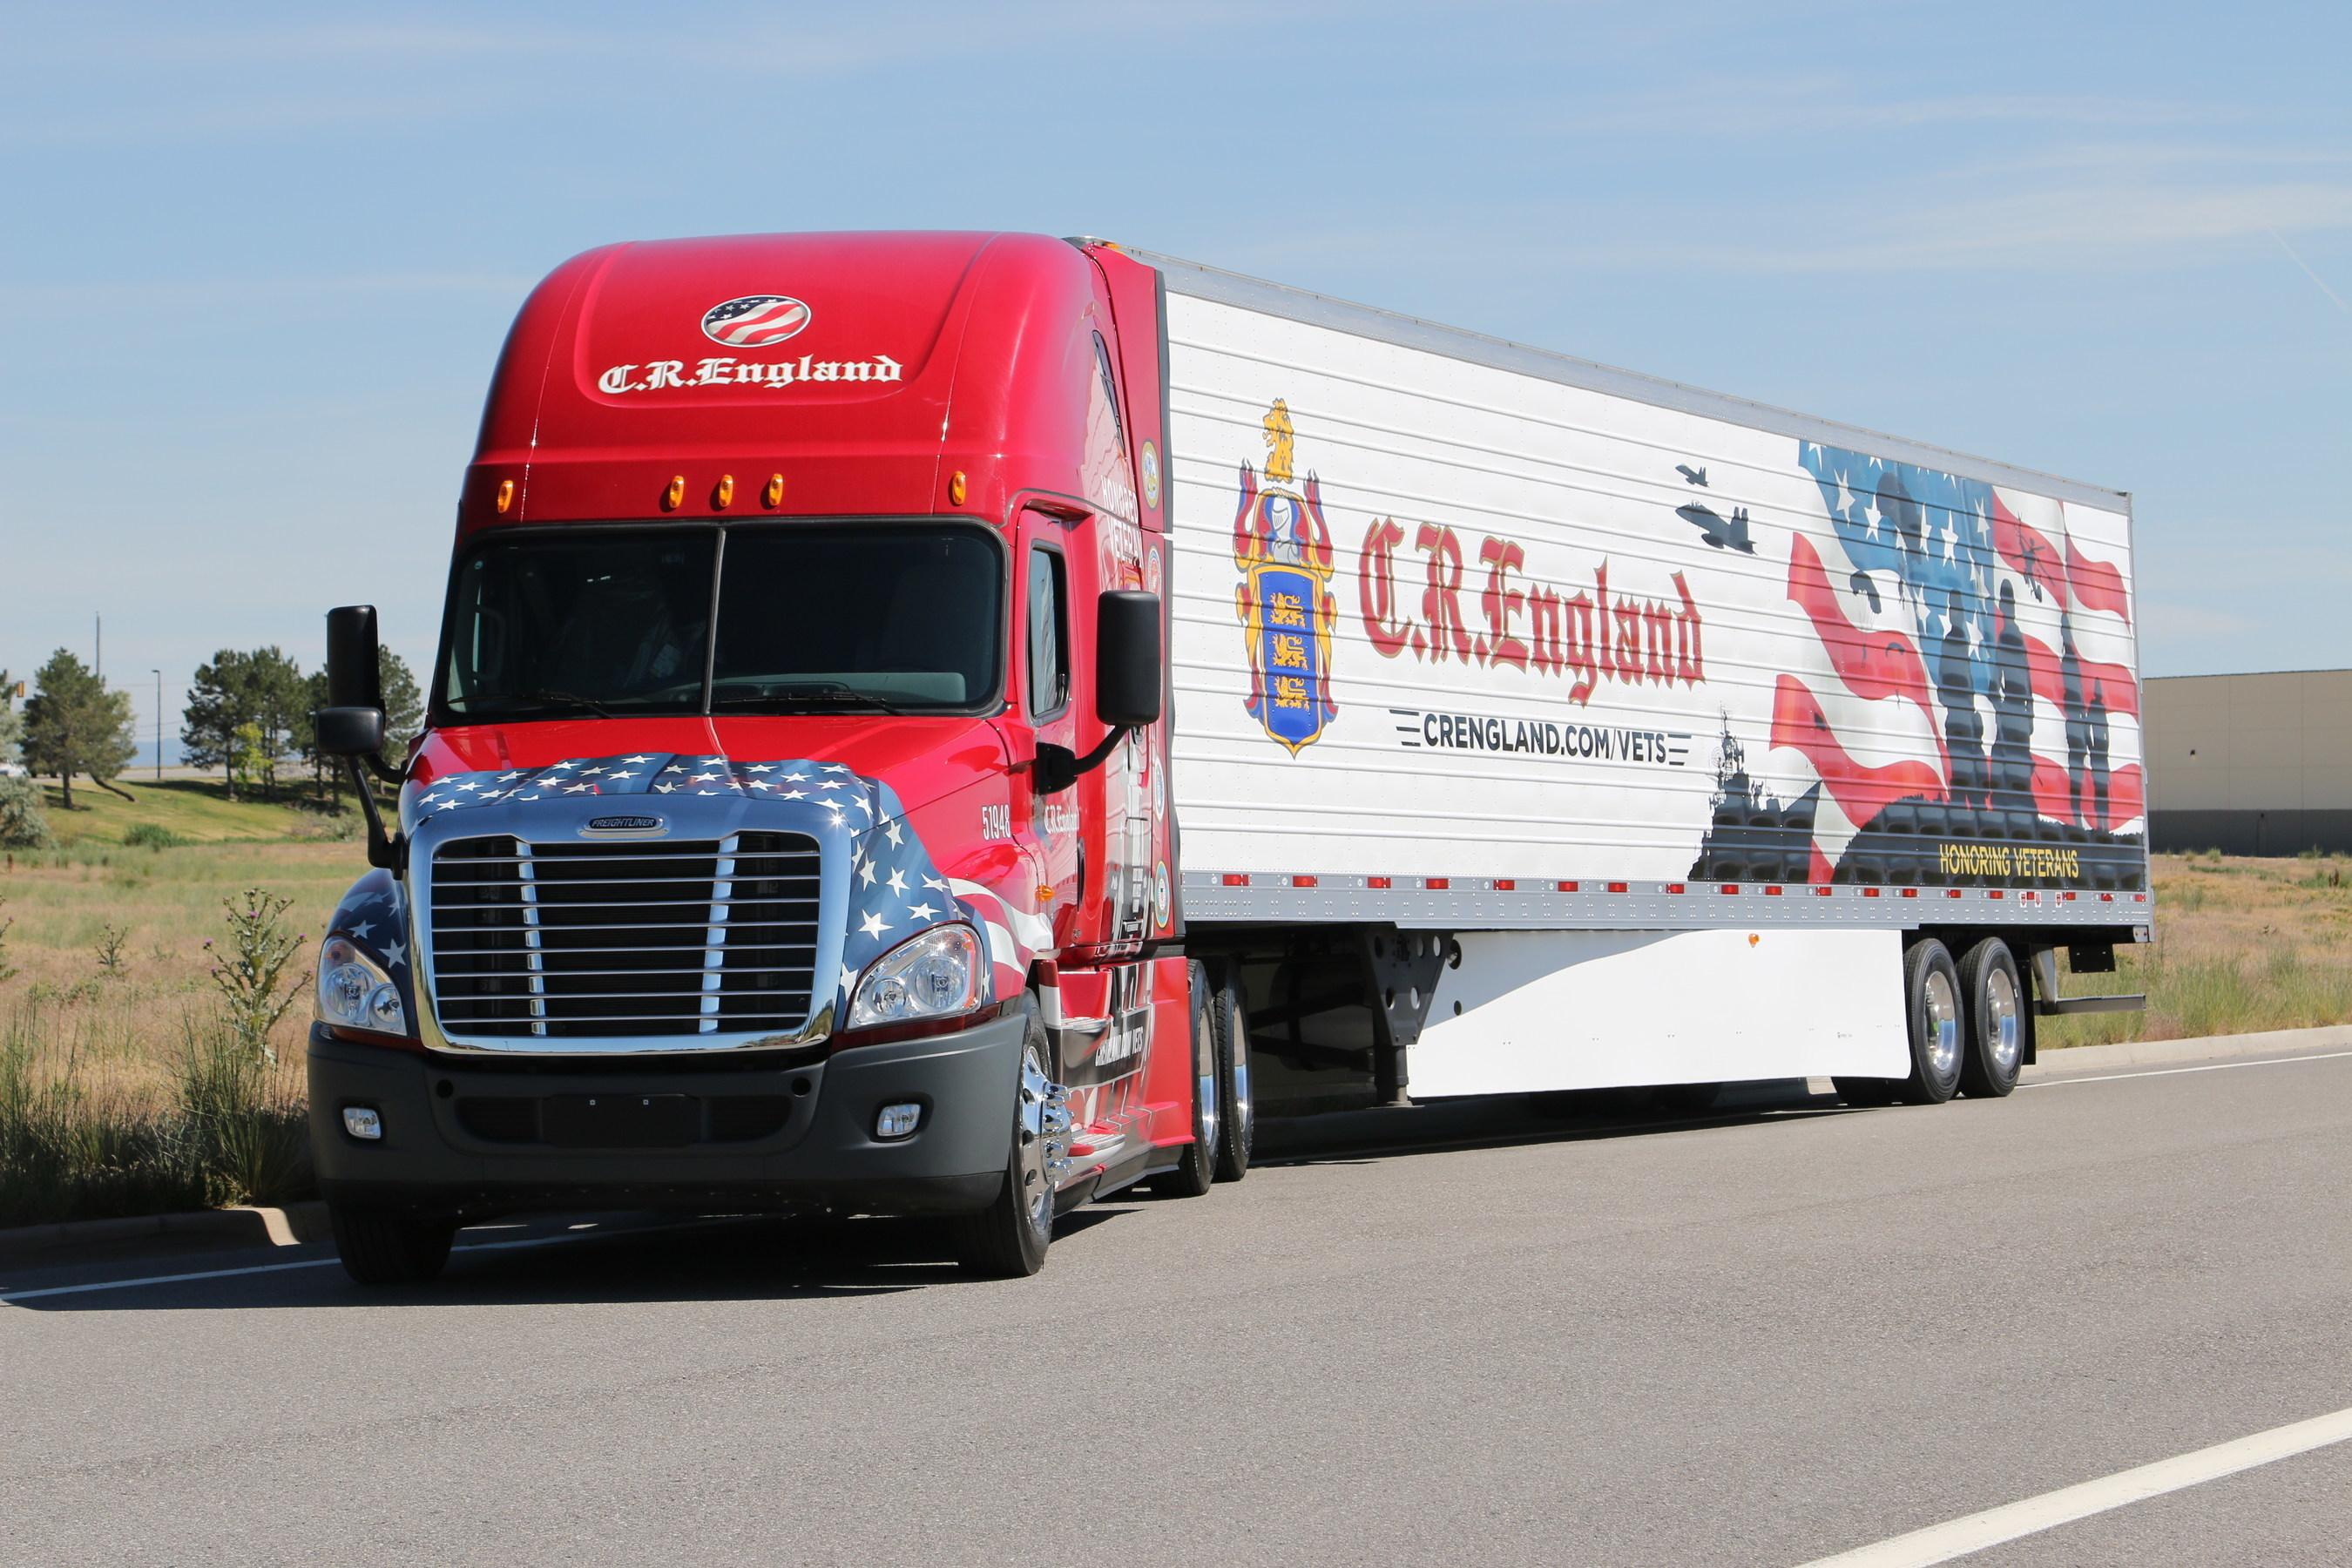 C.R. England Honored Veterans Truck and Trailer (PRNewsFoto/C.R. England, Inc.)